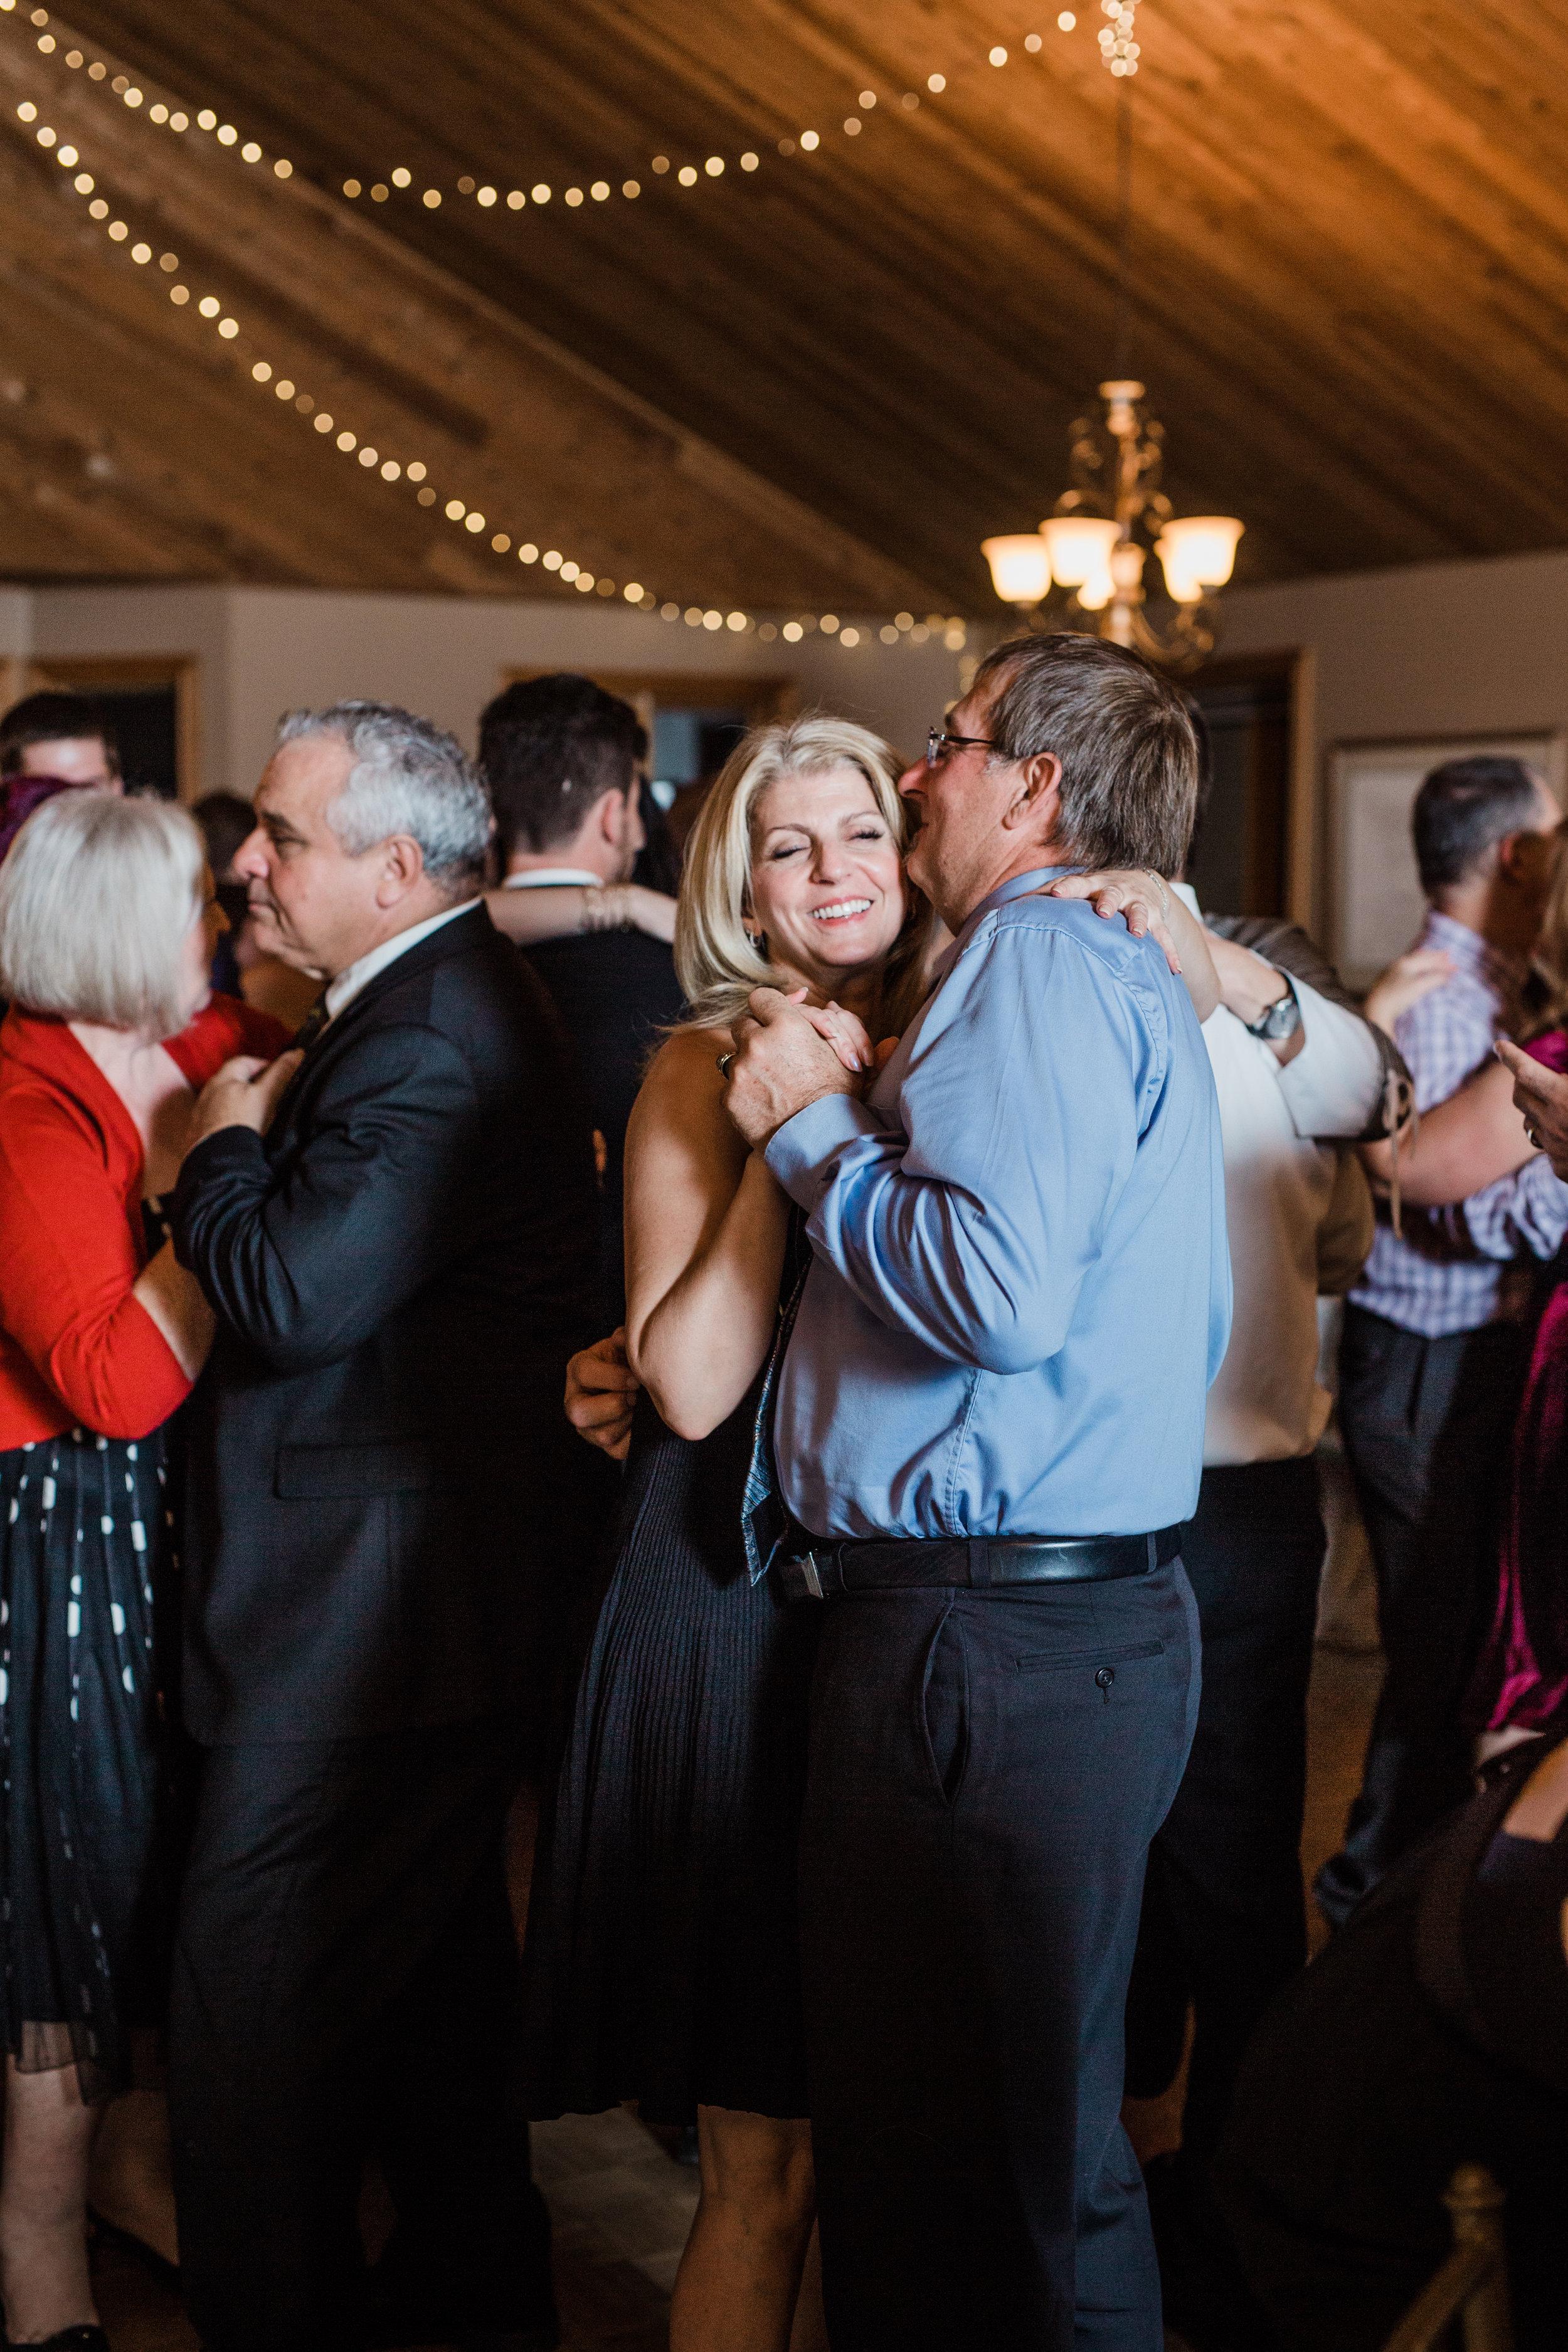 Amir-Golbazi-Danielle-Giroux-Photography_Toronto-Wedding_Cedarwood_Rachel-Paul_782.jpg